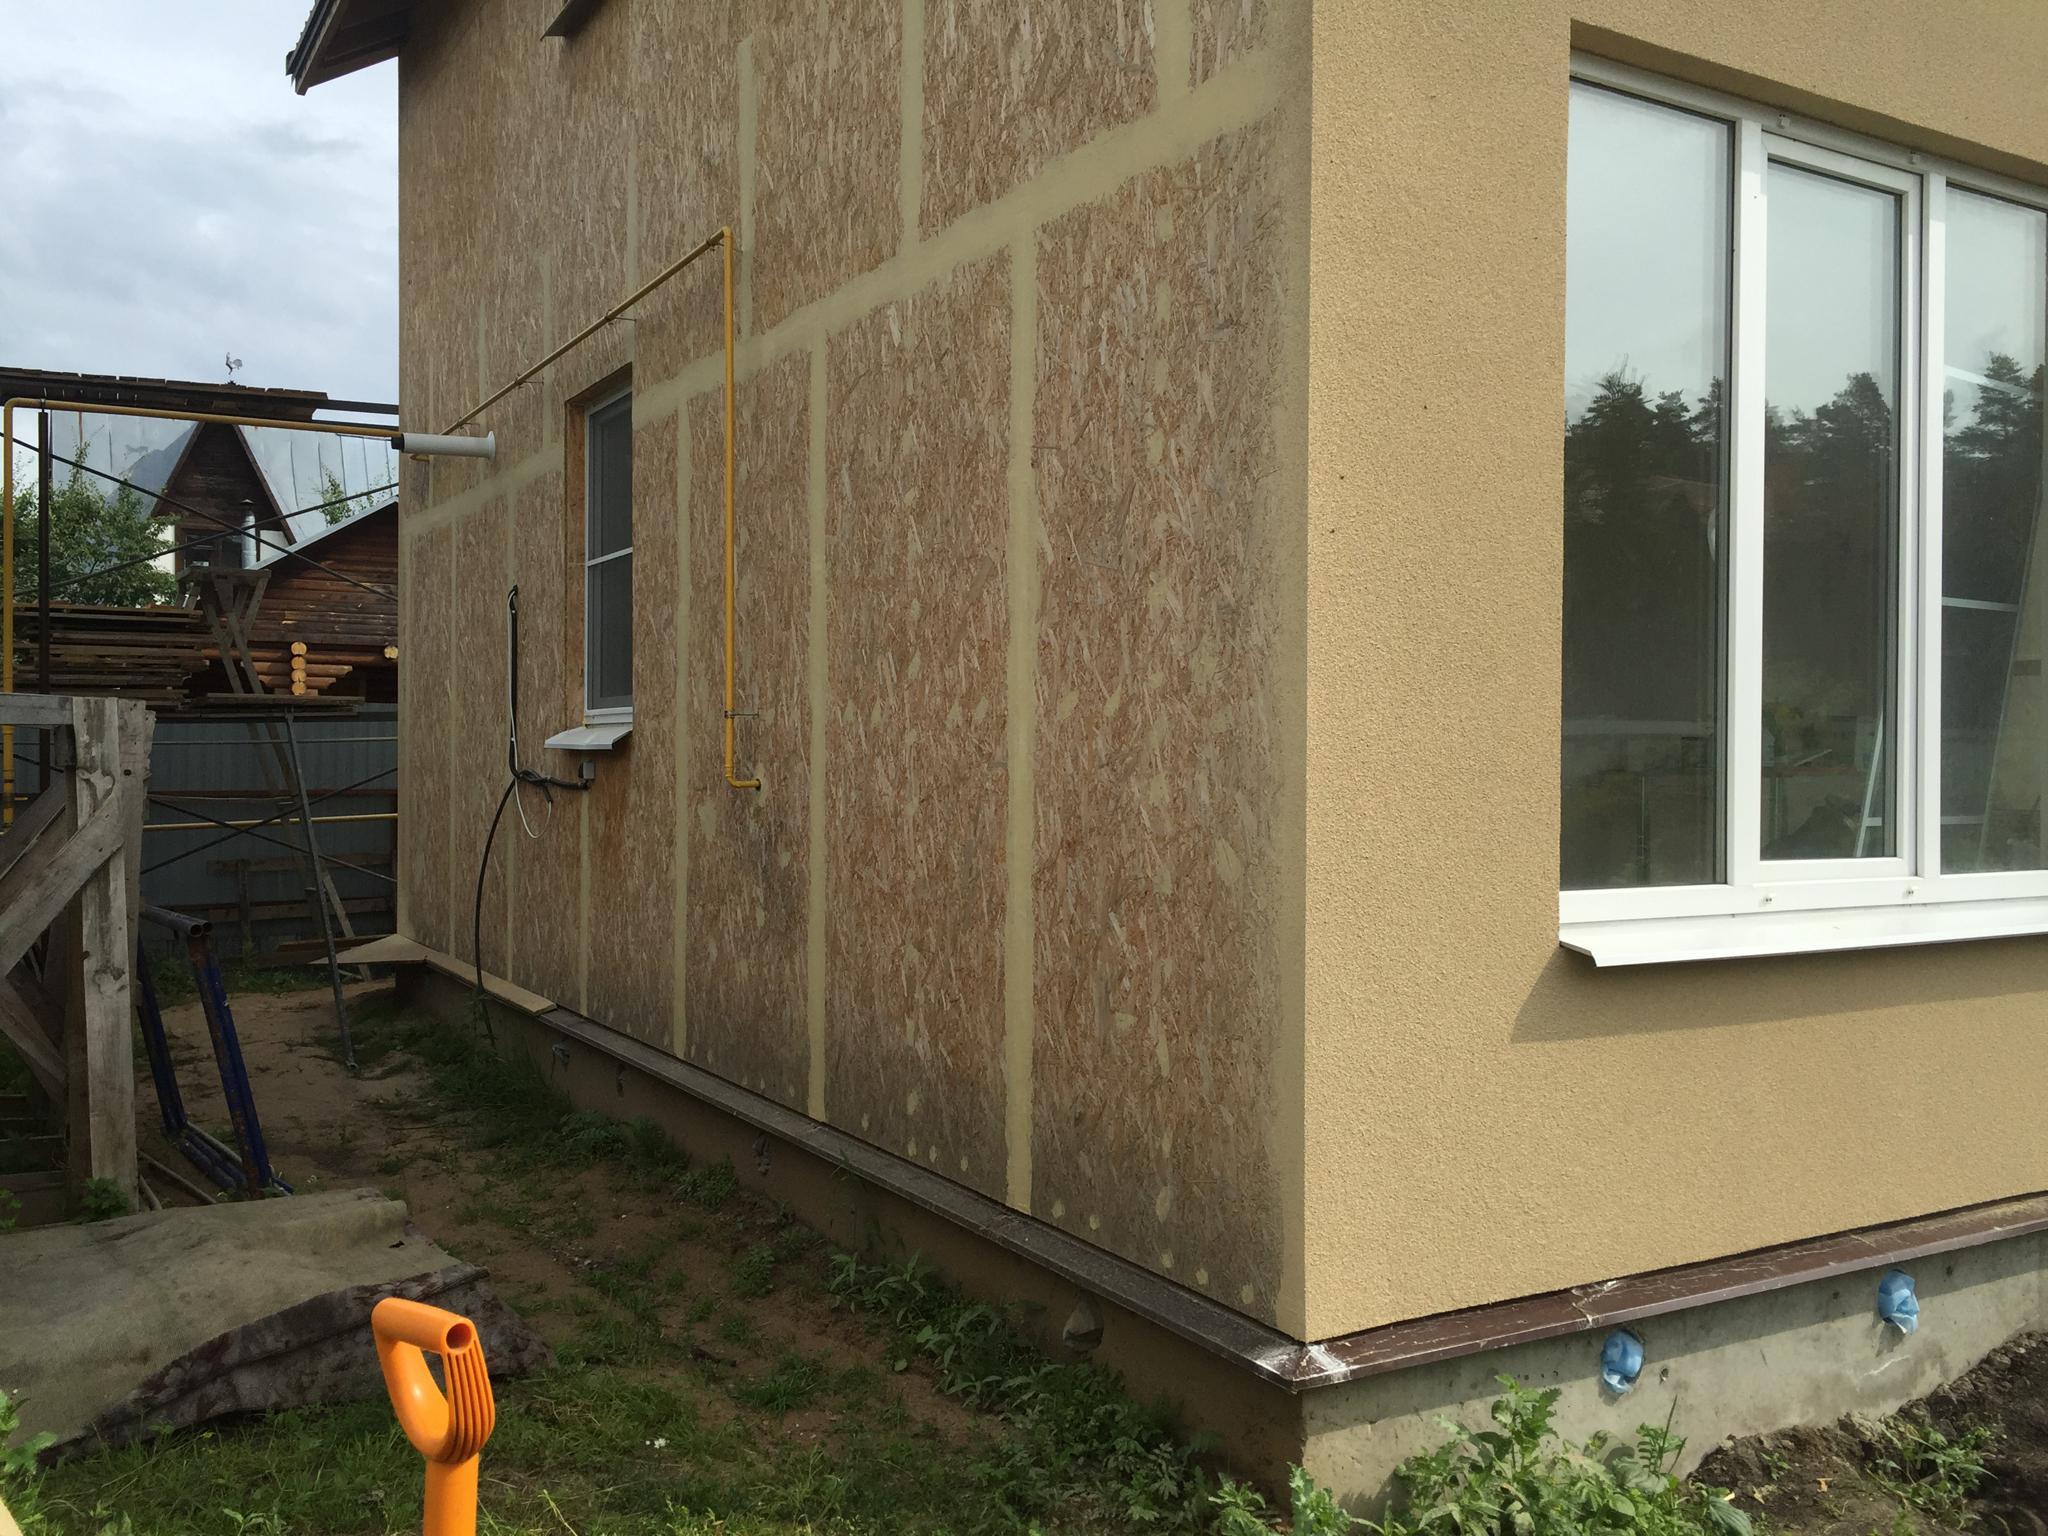 Дом из сип-панелей своими руками: сборка и монтаж (фото и видео)